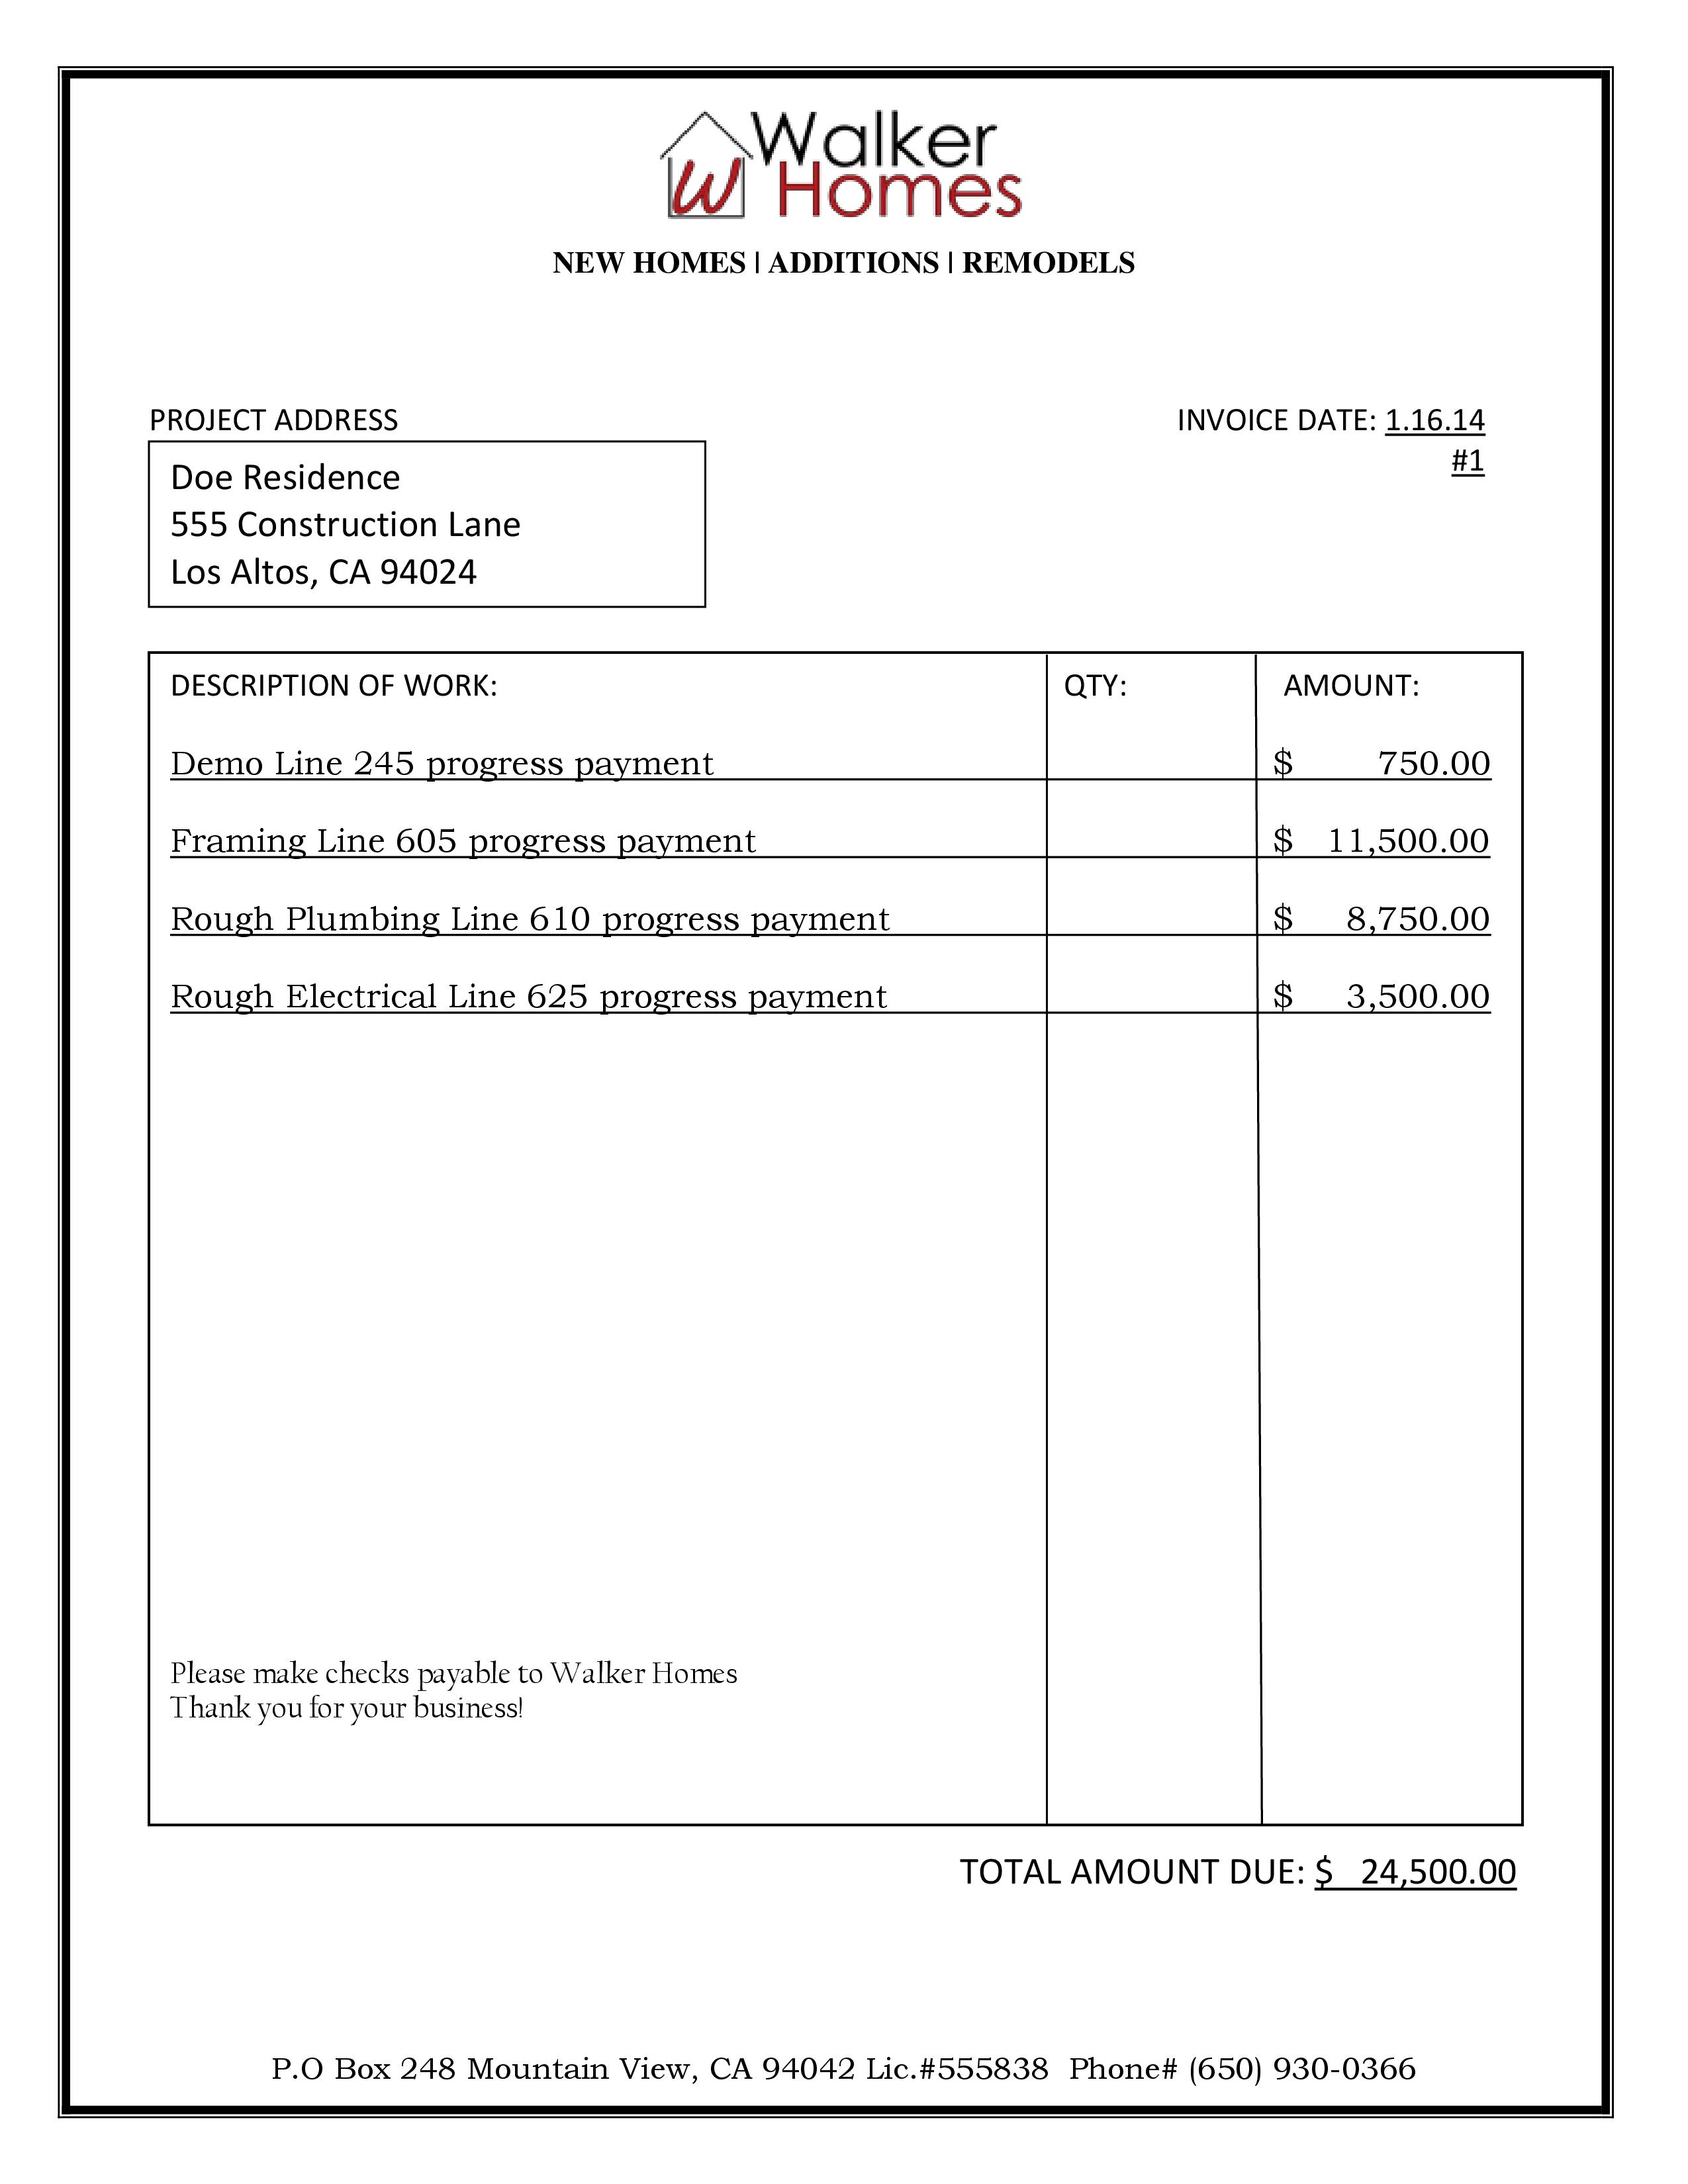 Final Invoice Sample Insssrenterprisesco - Final invoice template